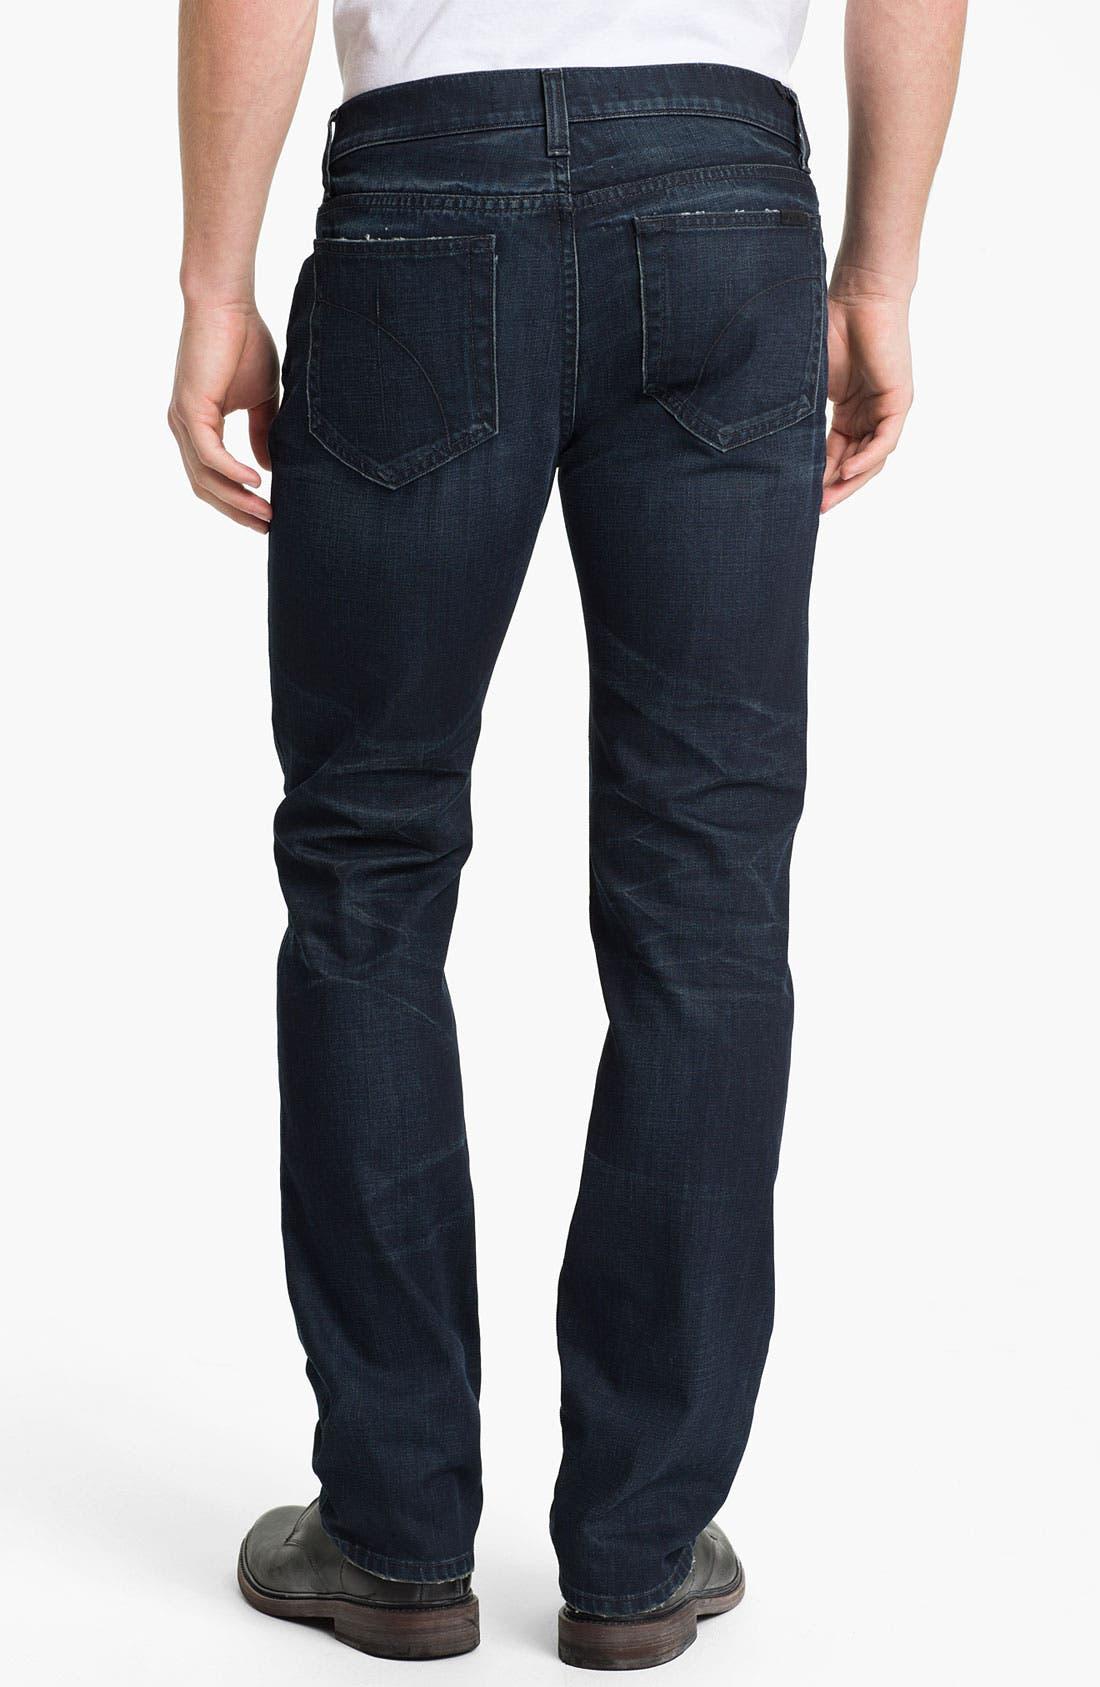 Alternate Image 1 Selected - Joe's 'Brixton' Slim Straight Leg Jeans (Kensington)